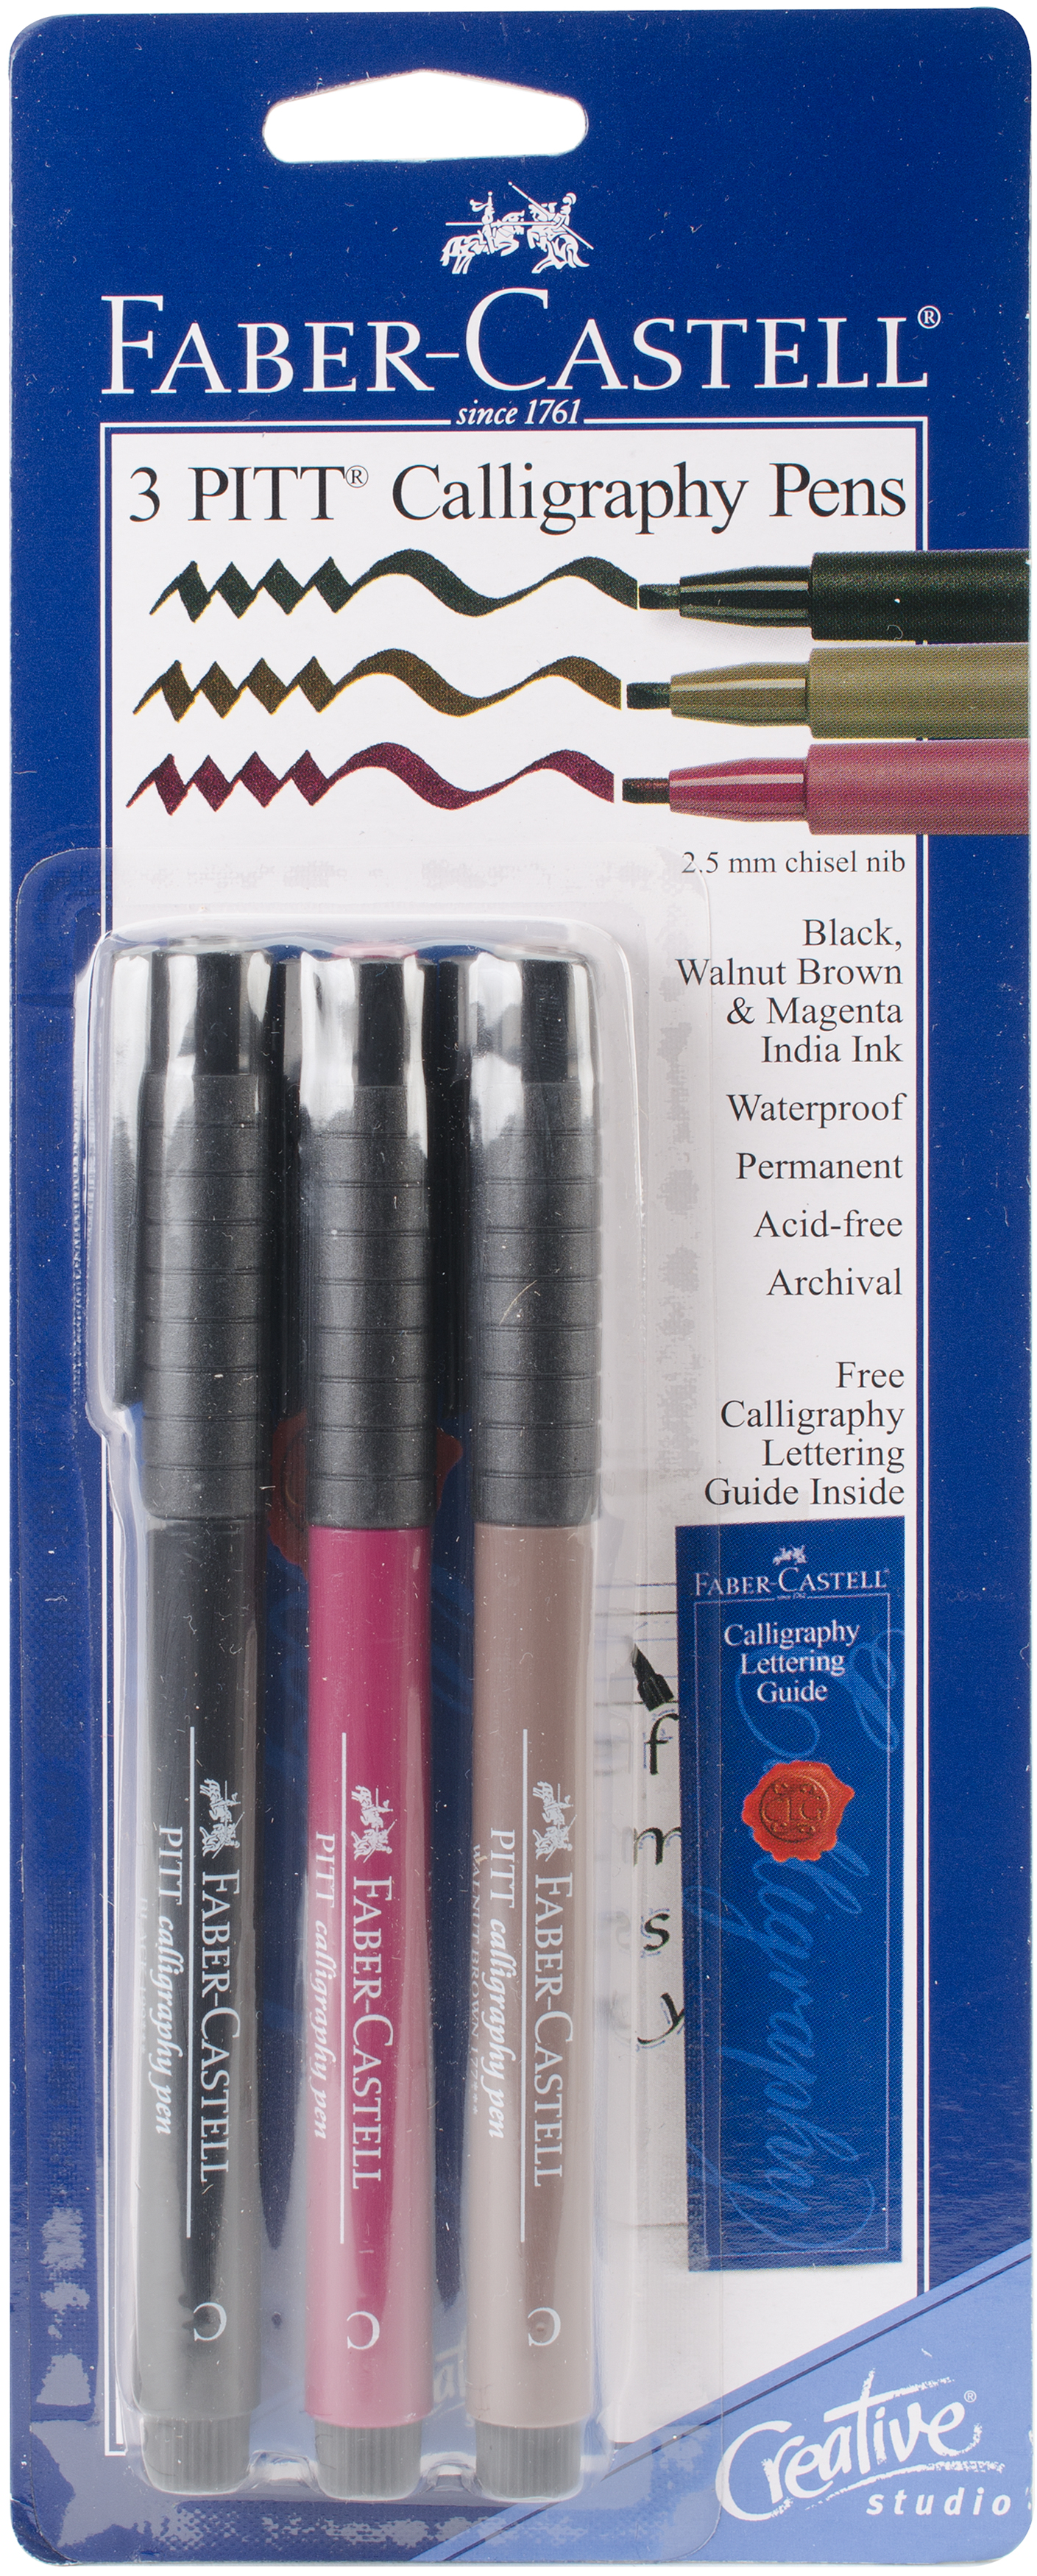 PITT Calligraphy Pens 2.5mm Chisel Tip 3/Pkg-Magenta, Black & Walnut Brown